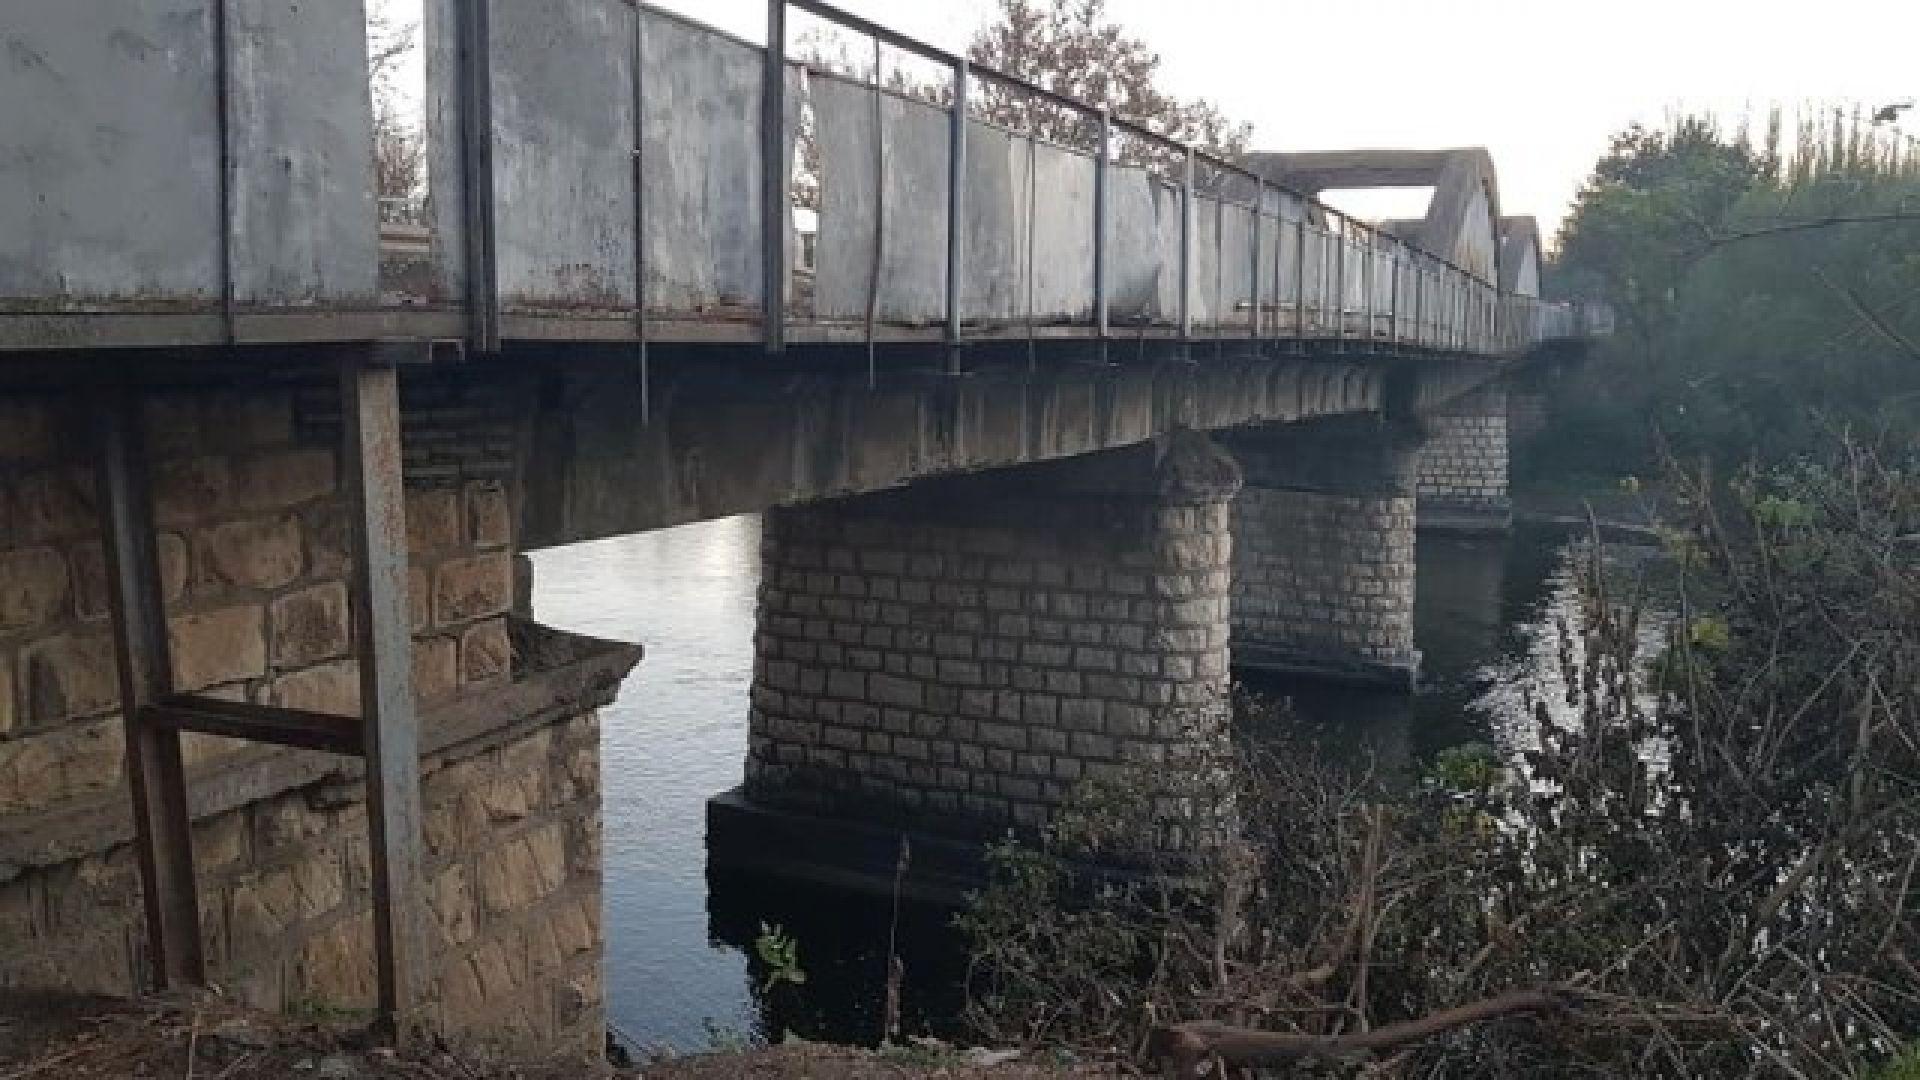 Срутен мост постави под блокада Койнаре и 5 села